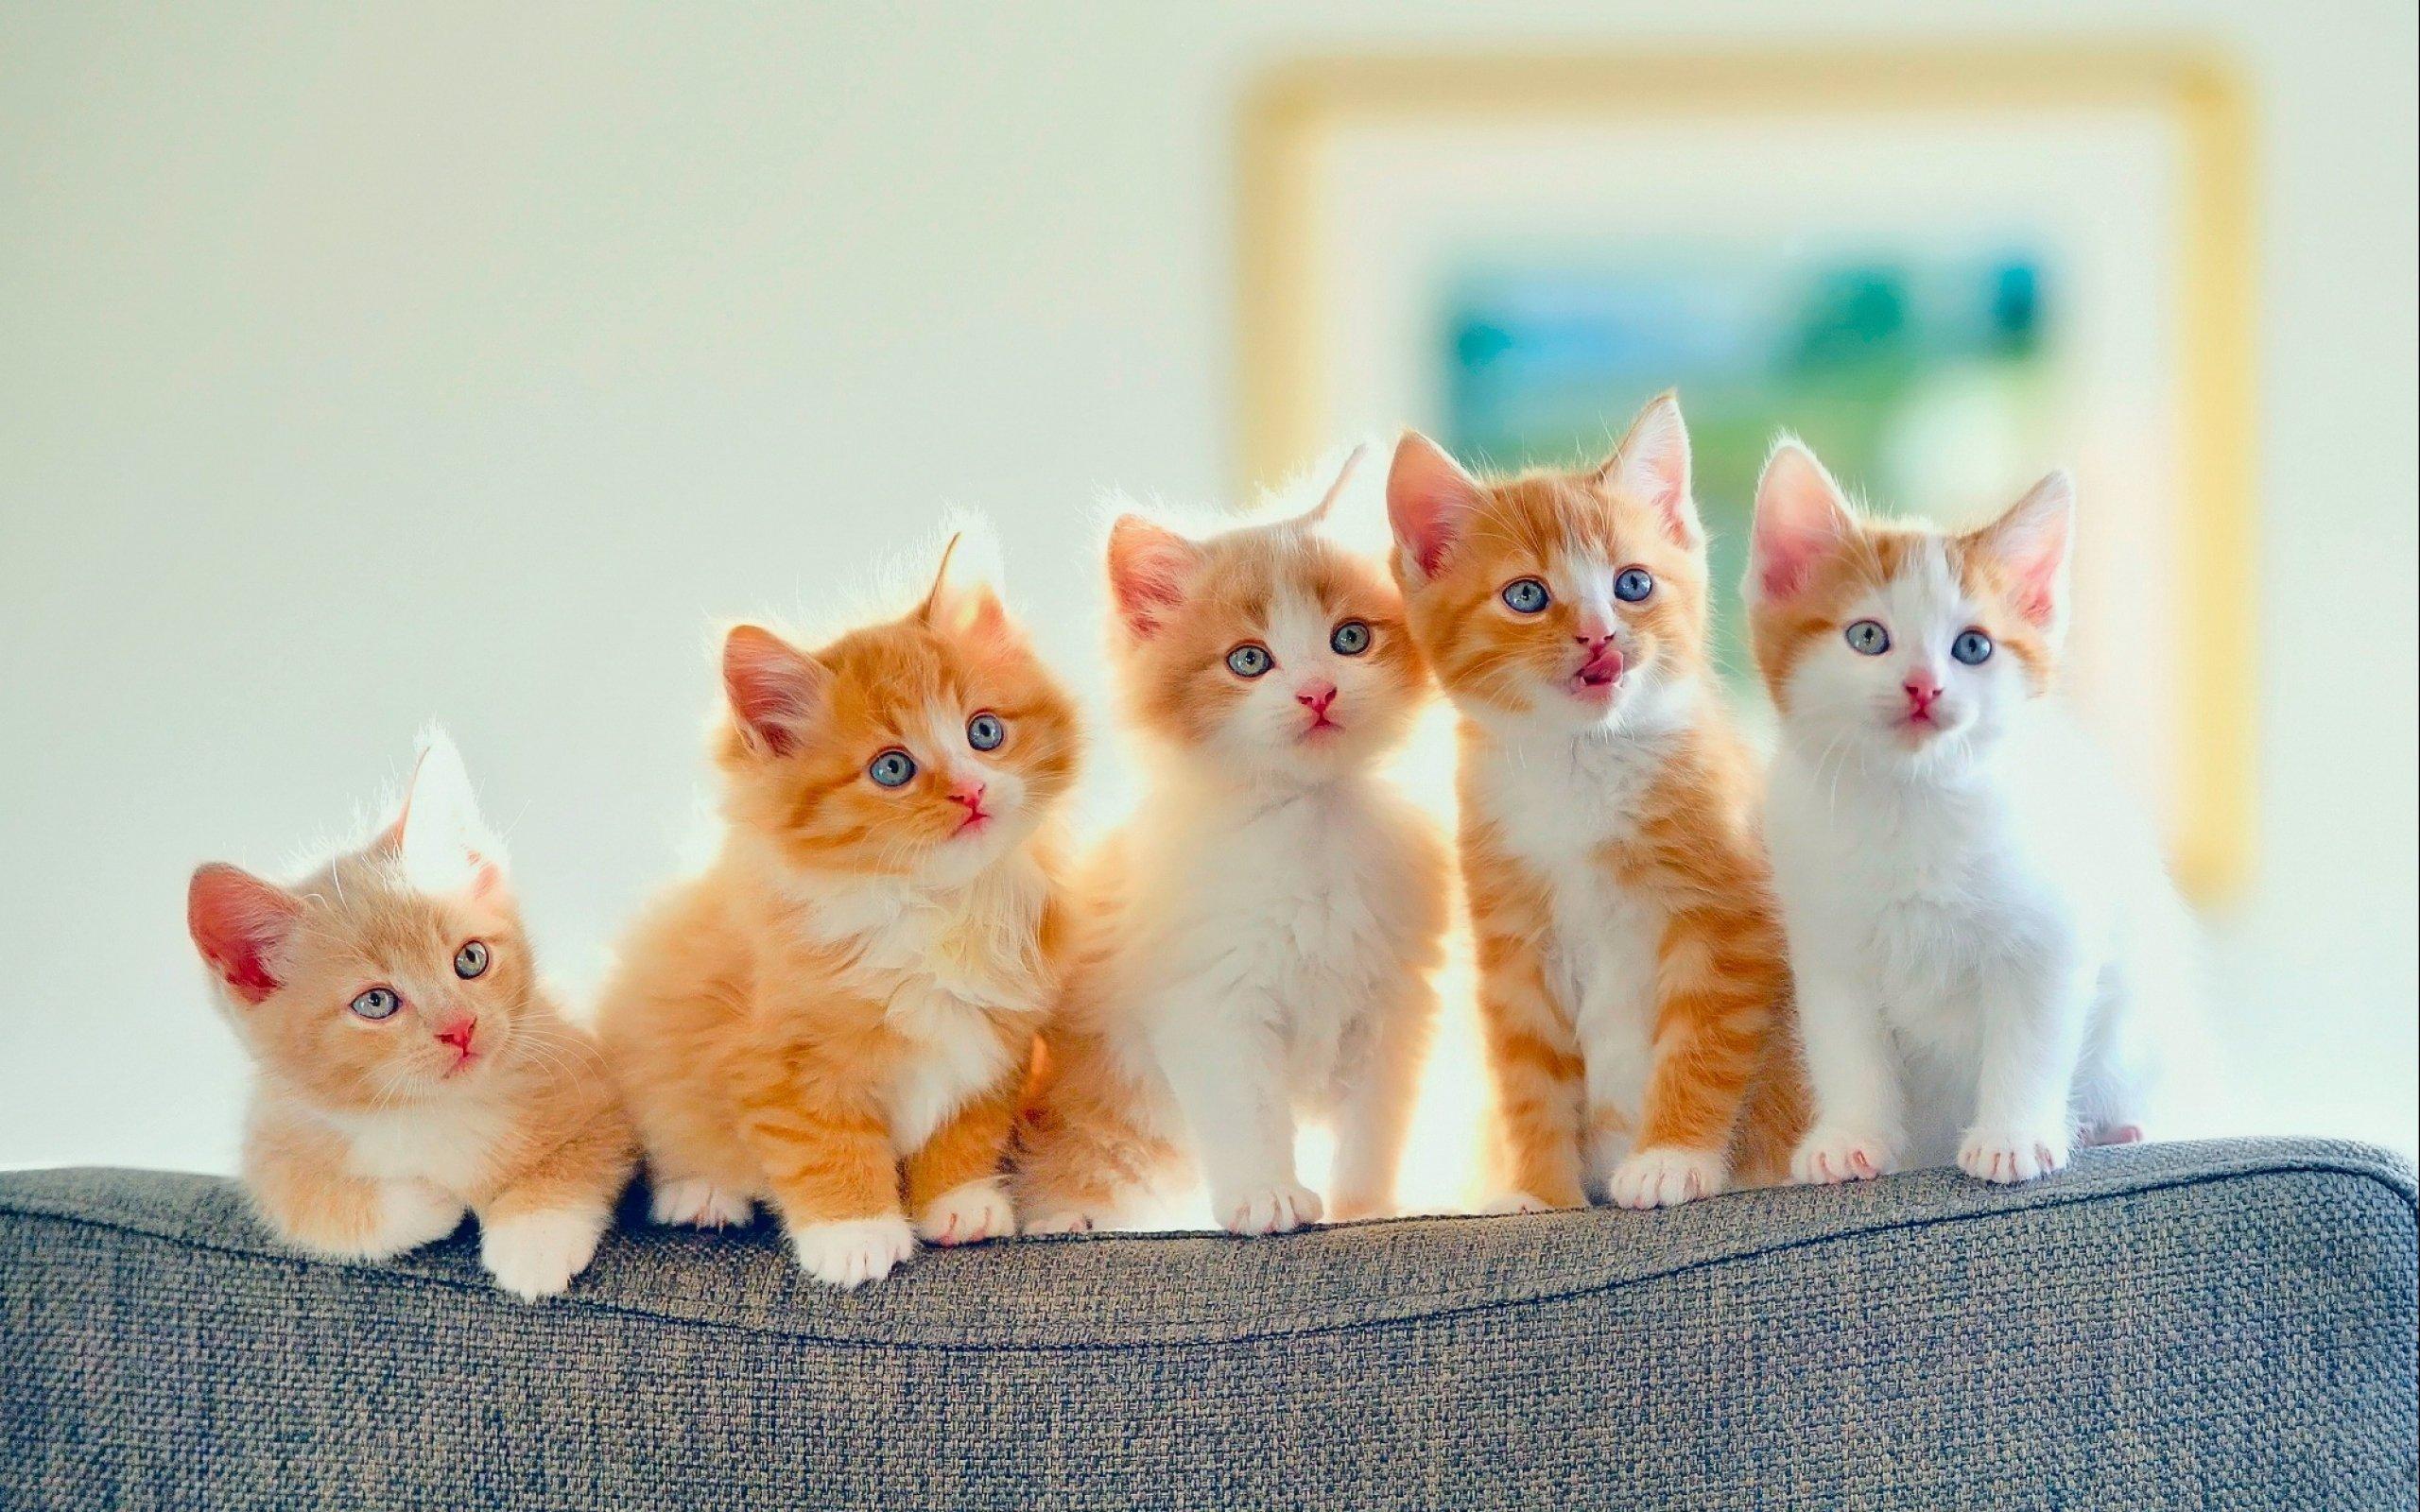 Wallpaper 2560x1600 Px Baby Cat Cats Cute Kitten Kittens 2560x1600 Coolwallpapers 1907143 Hd Wallpapers Wallhere